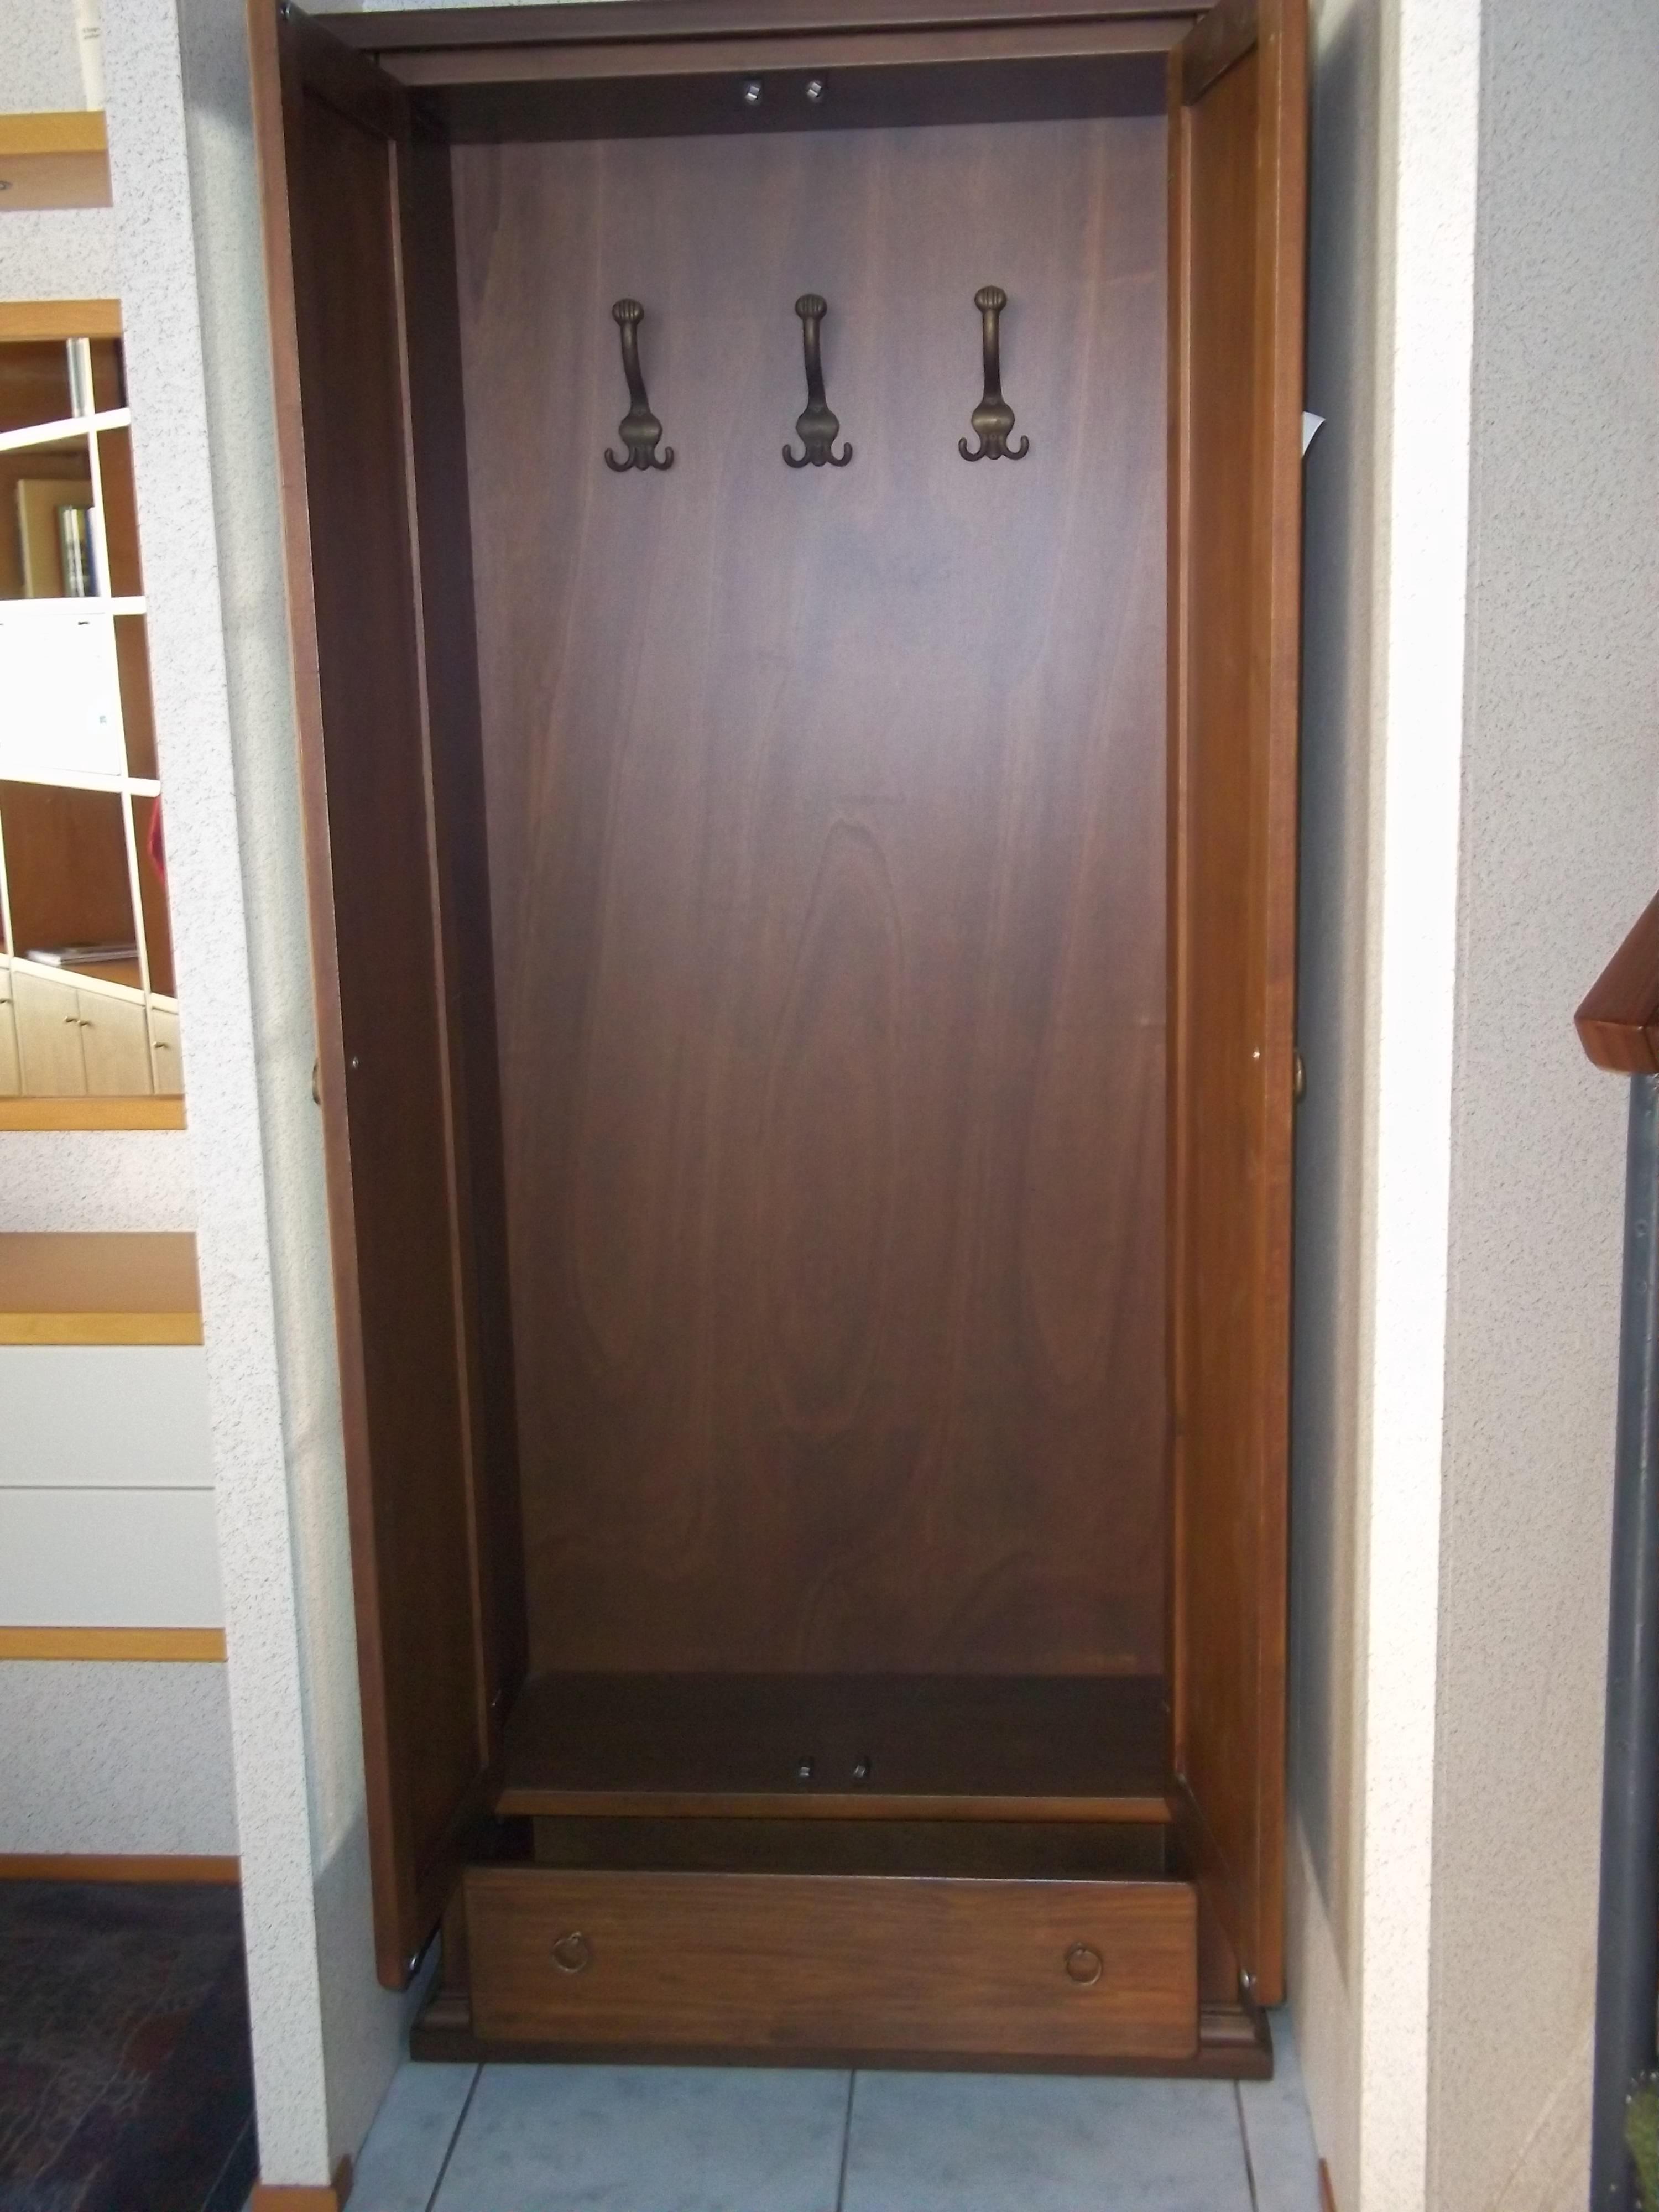 Armadio Arte Povera Ikea.Armadio Guardaroba Per Ingresso Latest Armadi E Guardaroba With